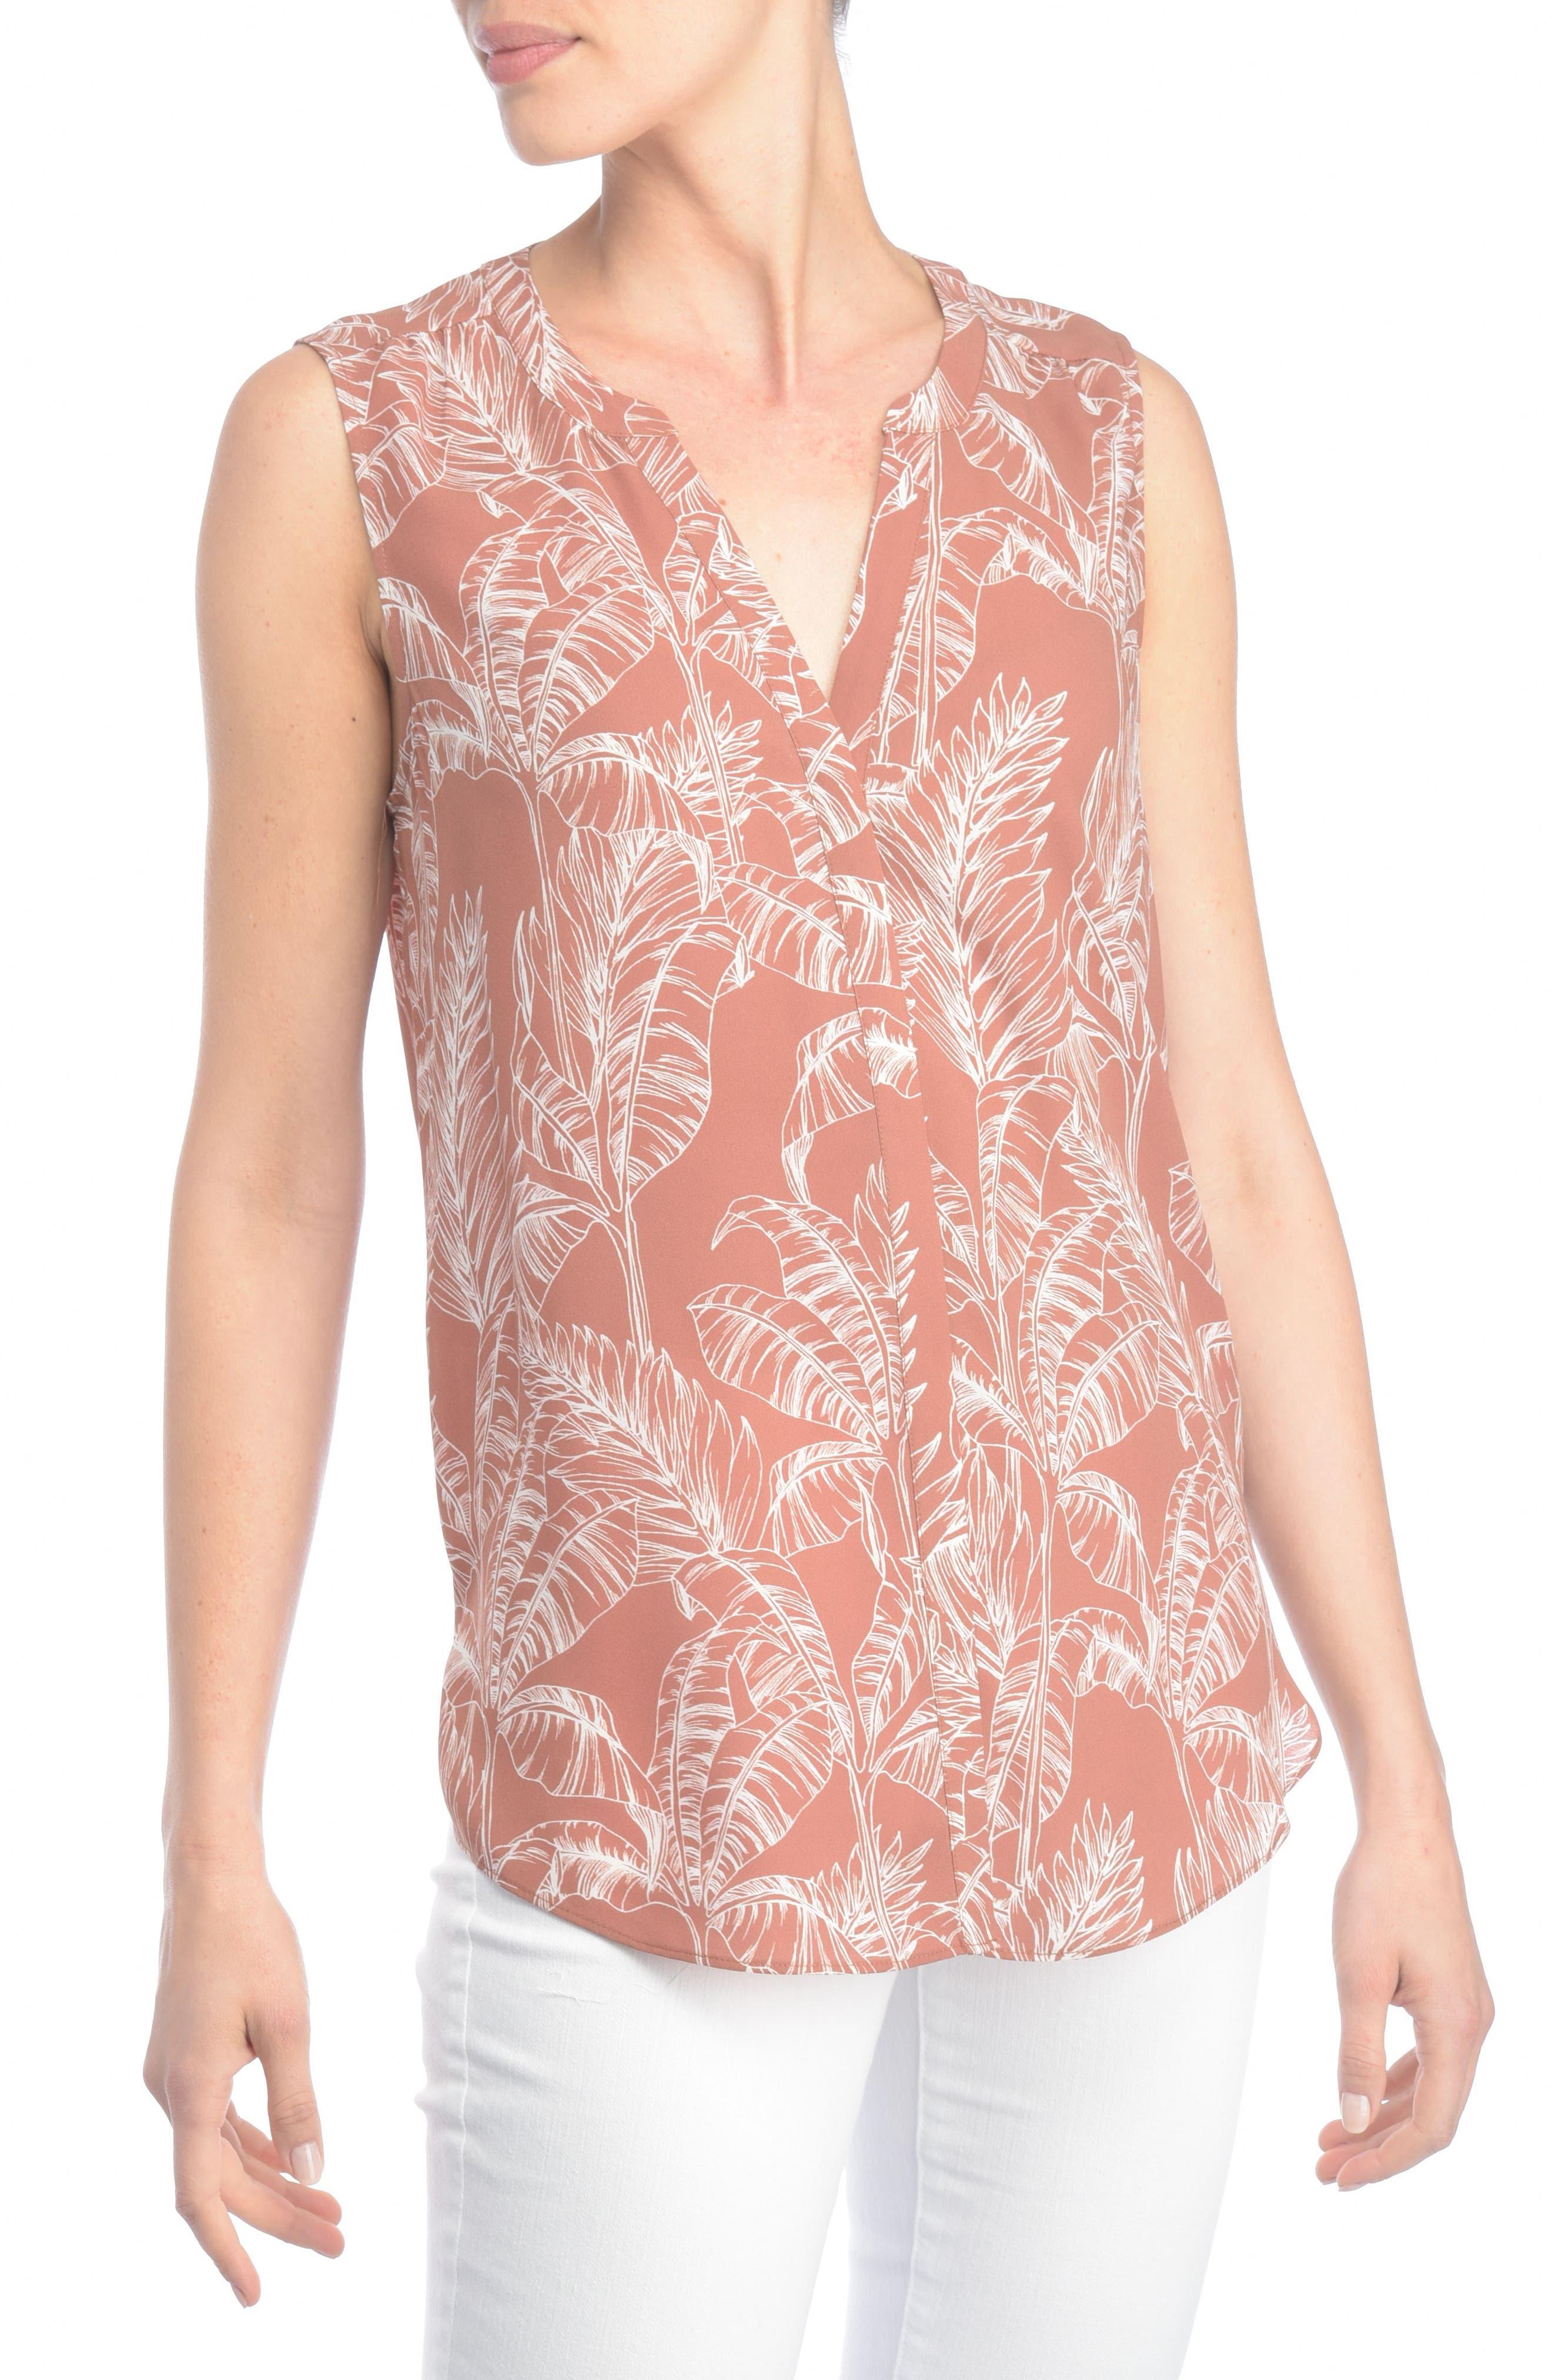 Main Image - NYDJ Print Pleat Back Sleeveless Split Neck Blouse (Regular & Petite) (Nordstrom Exclusive)